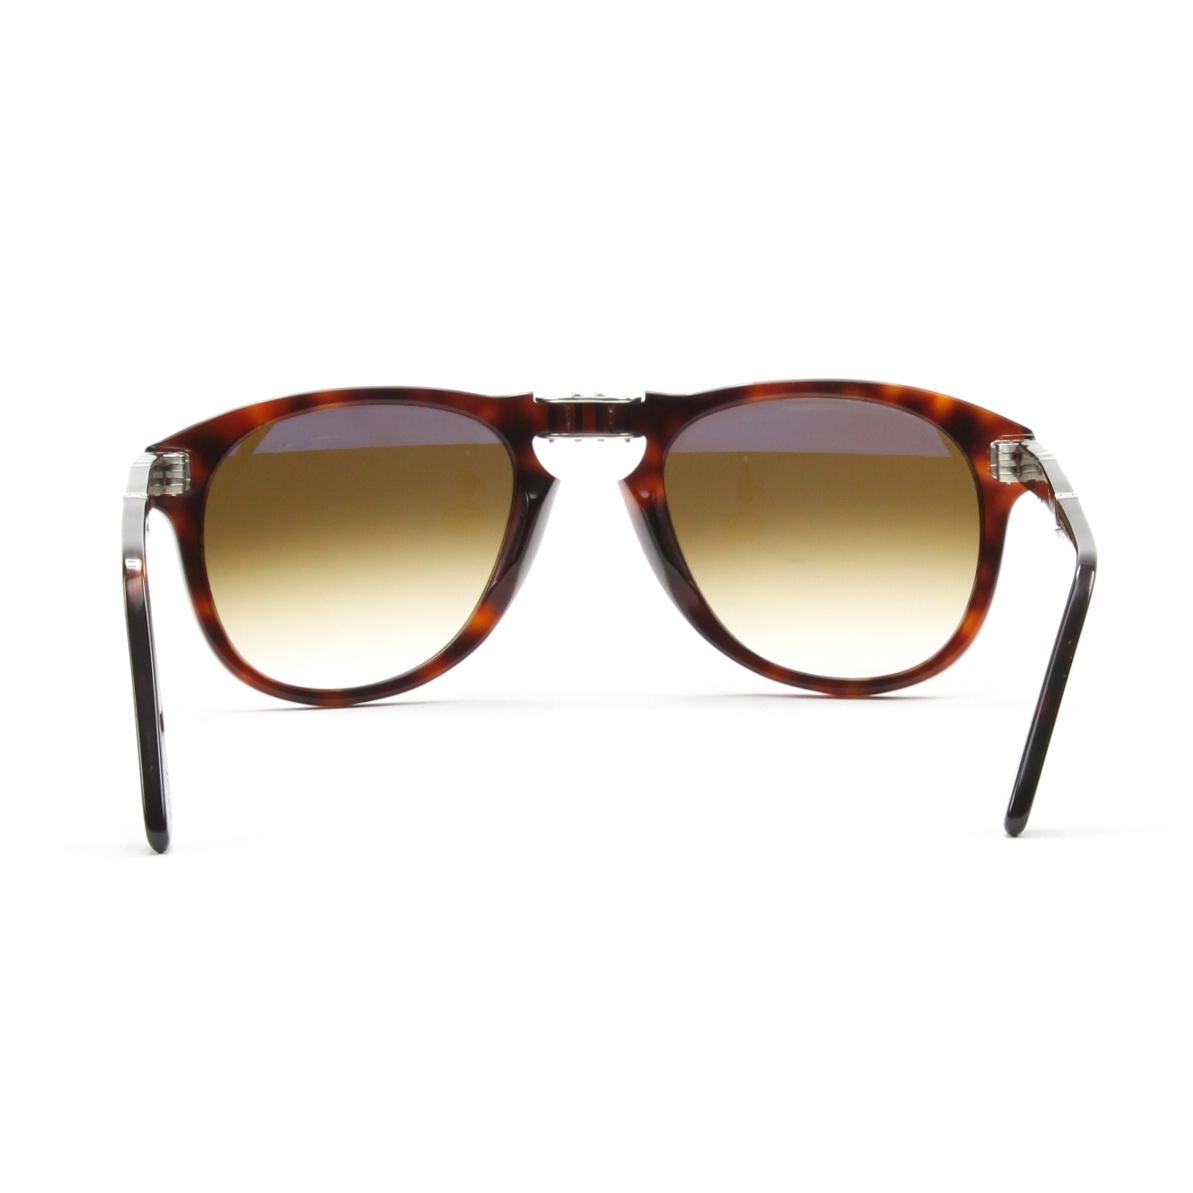 Persol 714 Folding Sunglasses 24/51 Brown Havana, Gradient Lenses PO0714 52mm | eBay